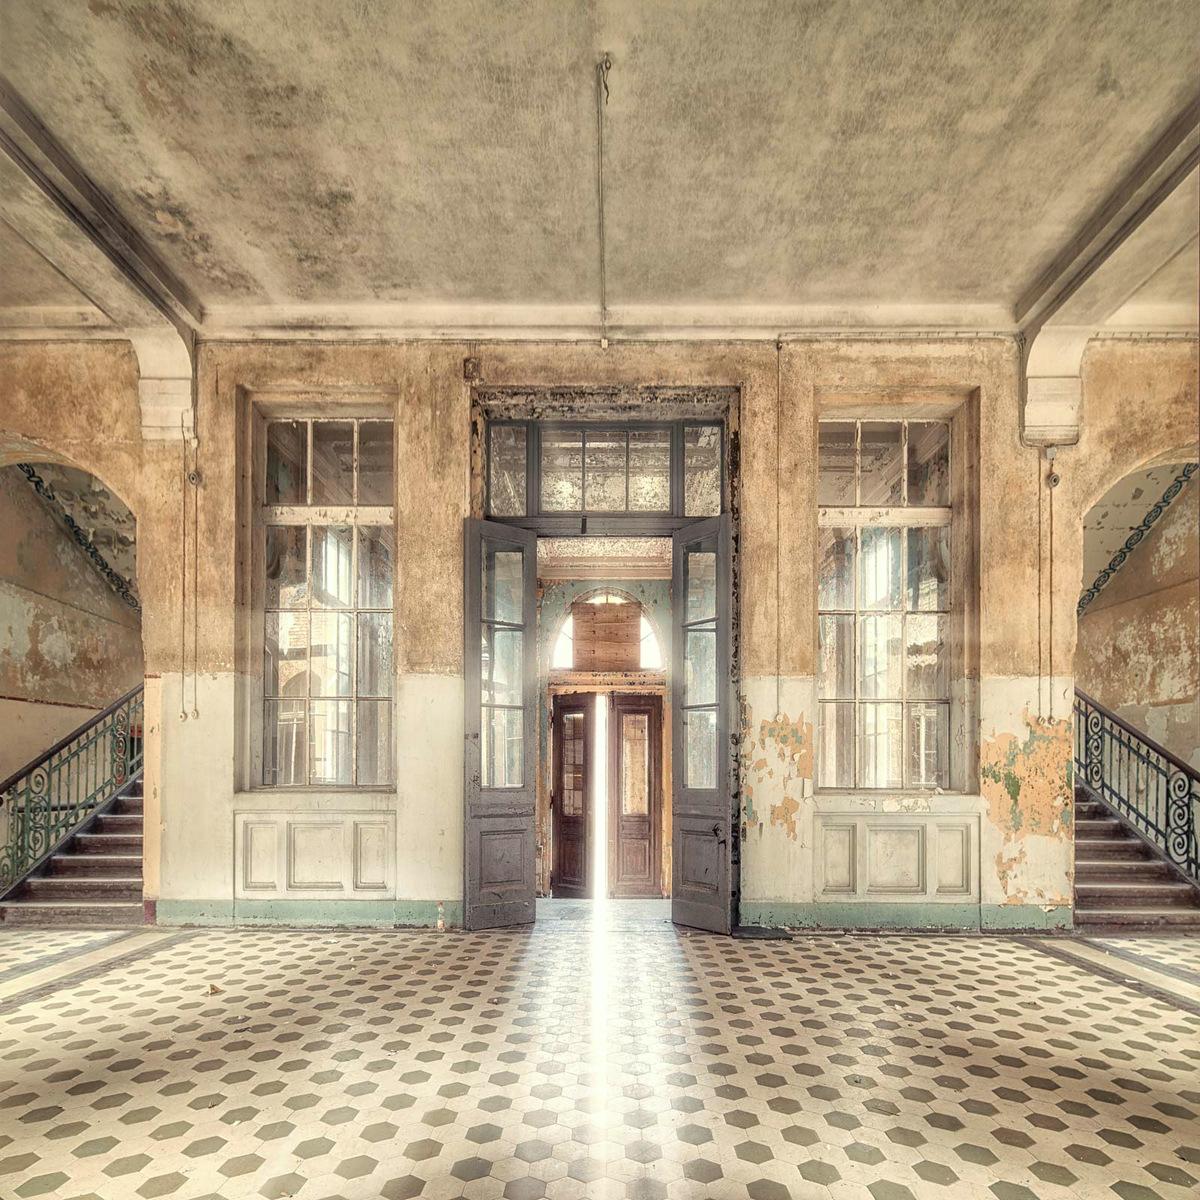 The beauty of Decay IX by Markus Studtmann